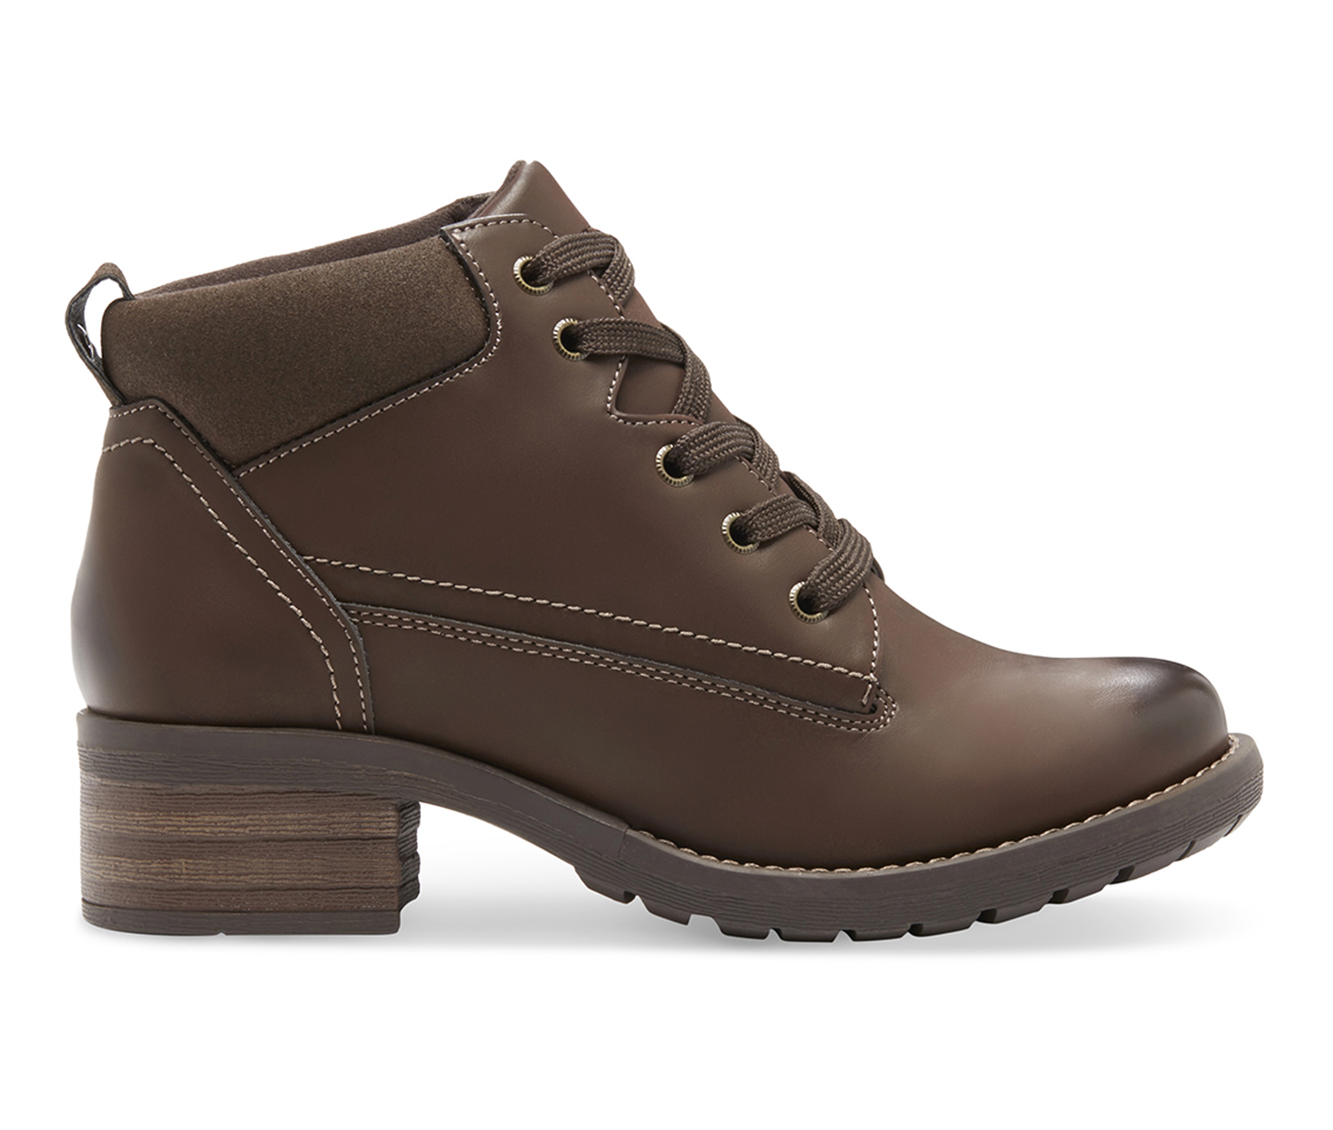 Eastland Bandana Women's Boot (Brown Faux Leather)